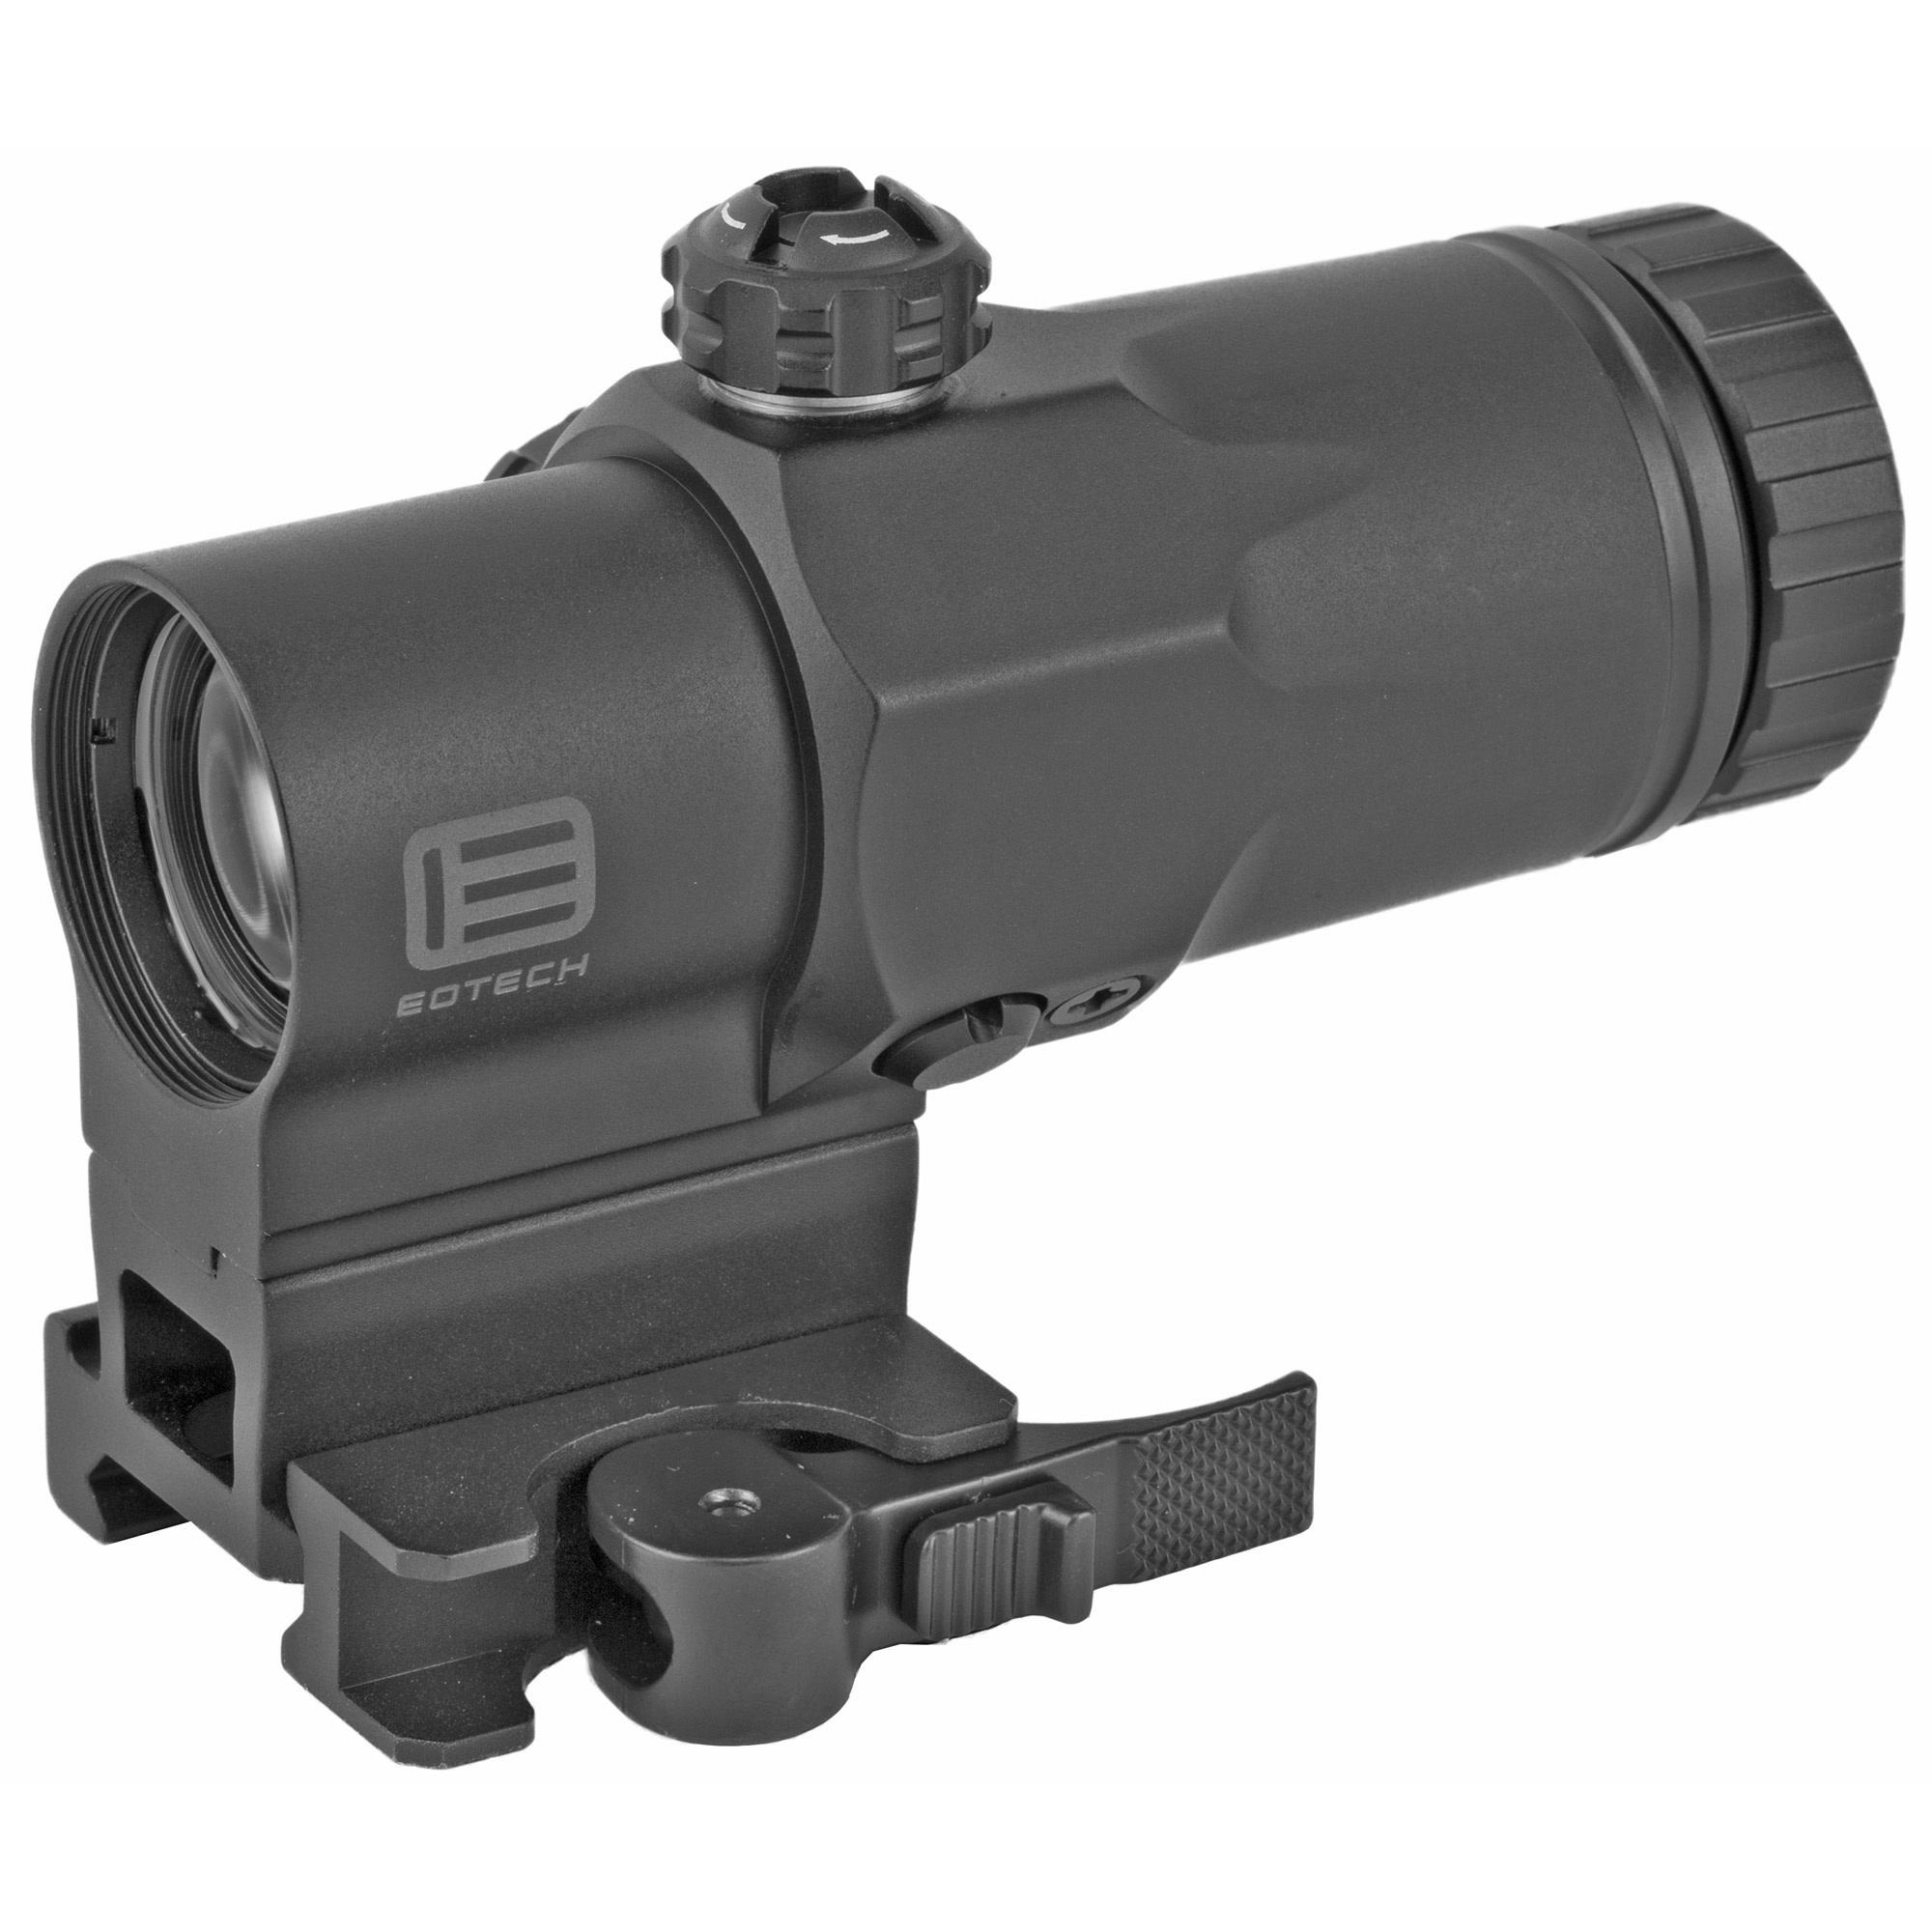 EOTech 3X magnifier W/QD mount quick detach fixed mount